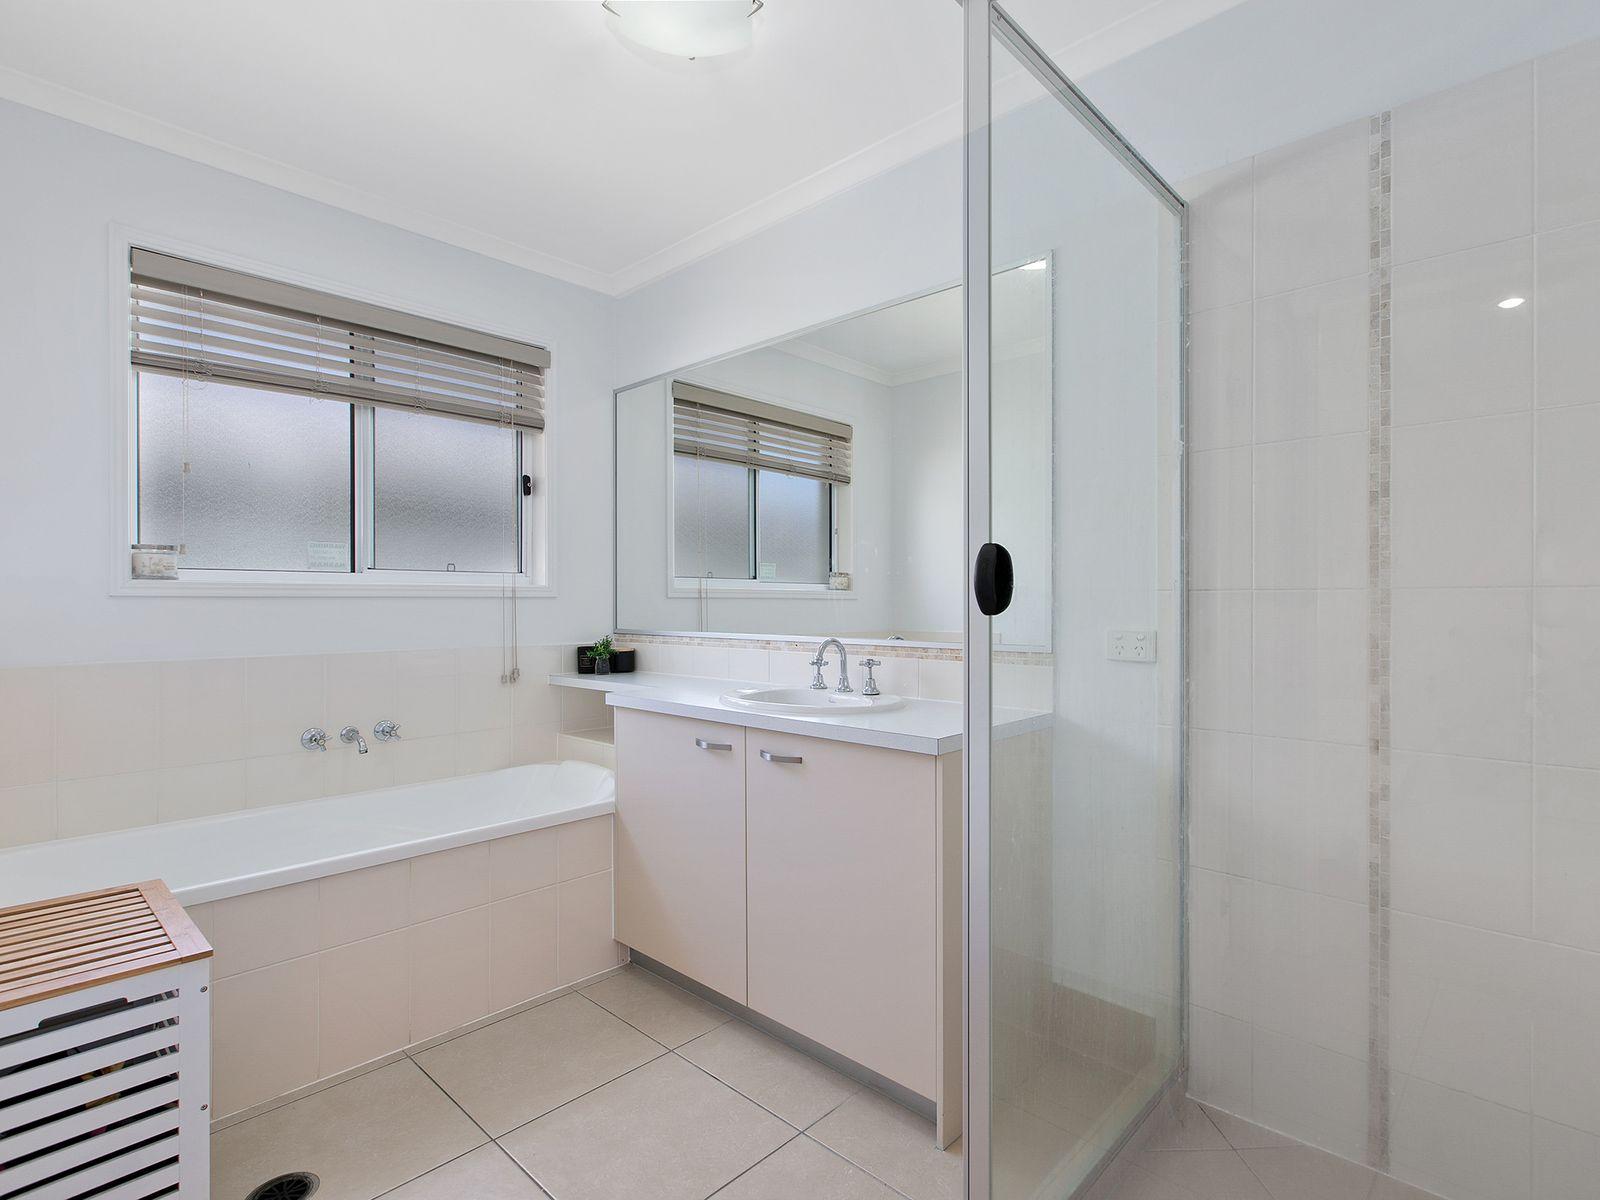 12 Alpinia Street, Sippy Downs, QLD 4556